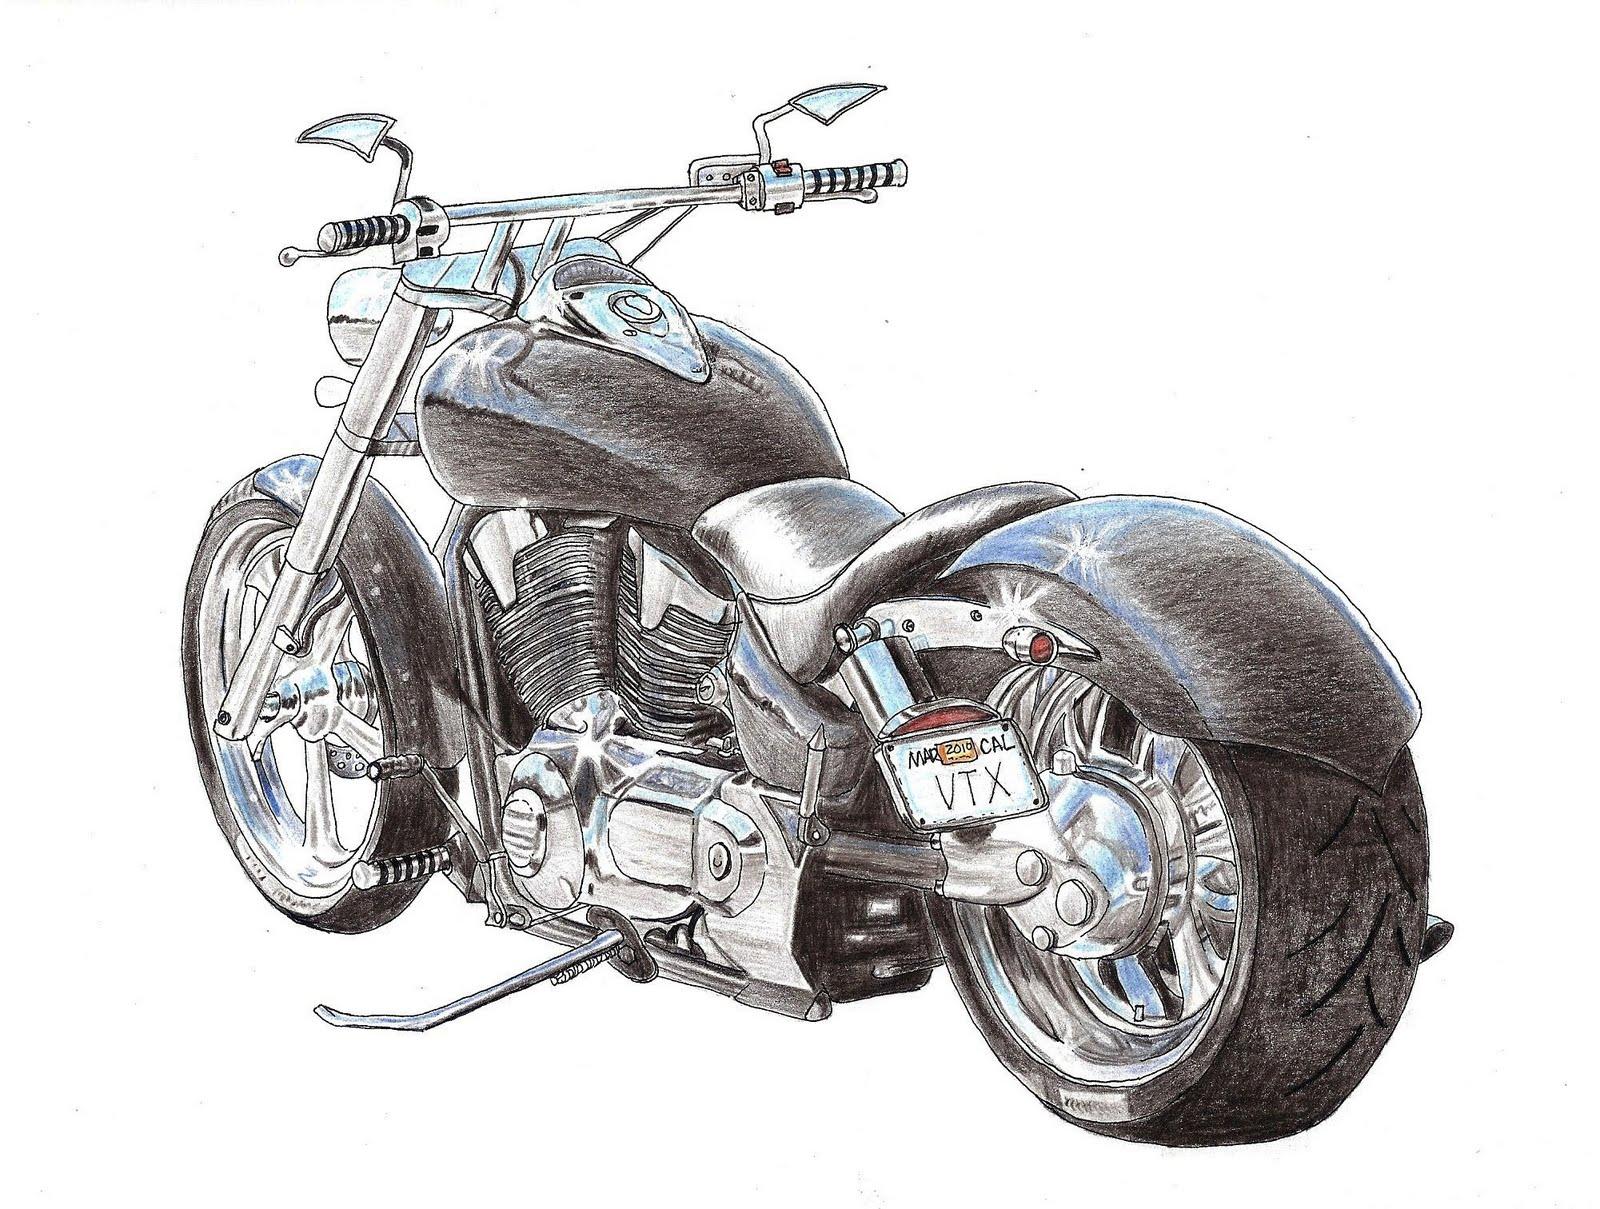 custom honda vtx by leo hartshorn [ 1600 x 1209 Pixel ]